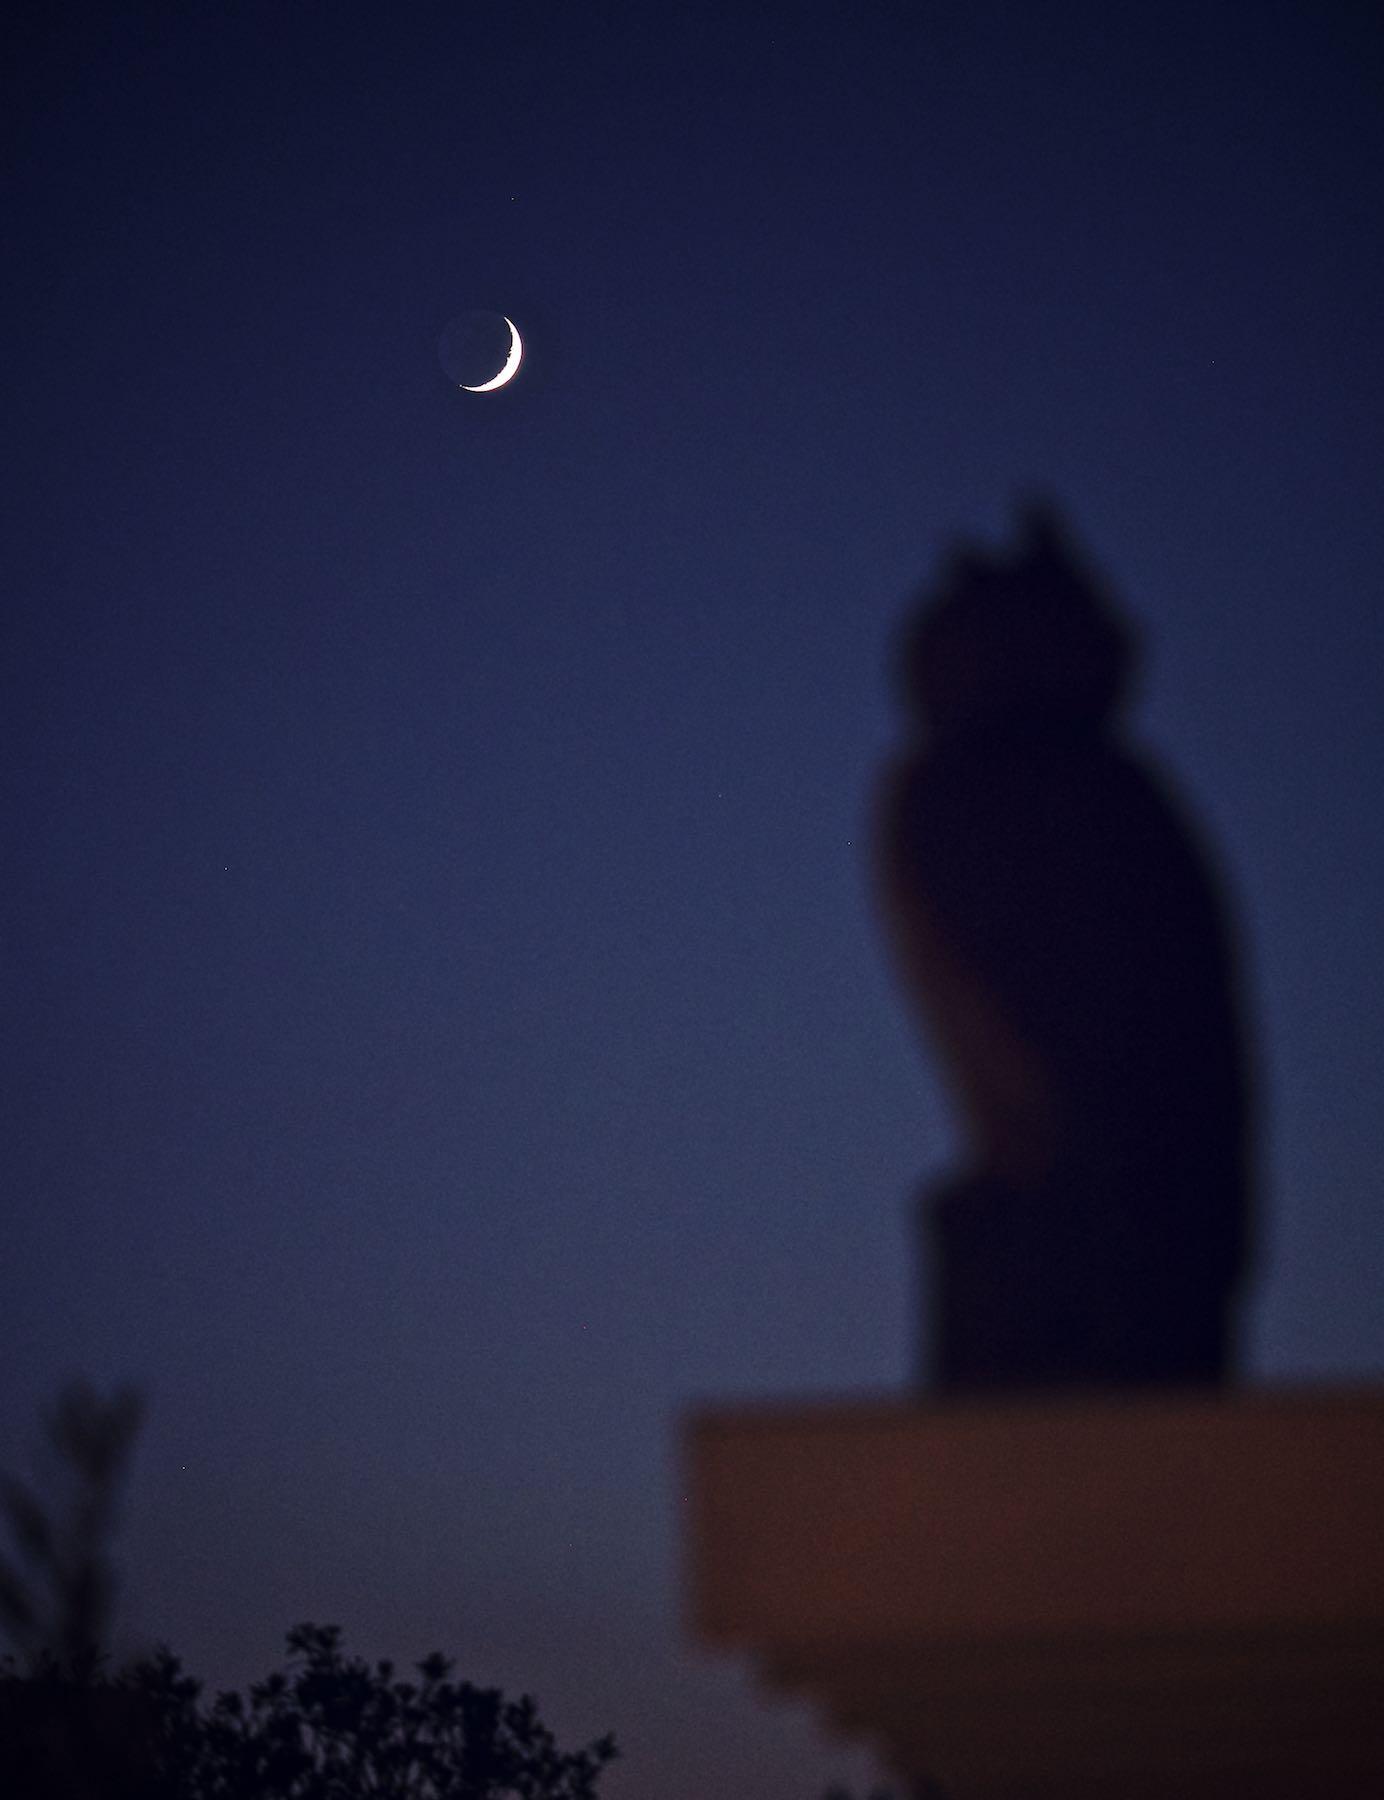 Moonwatching